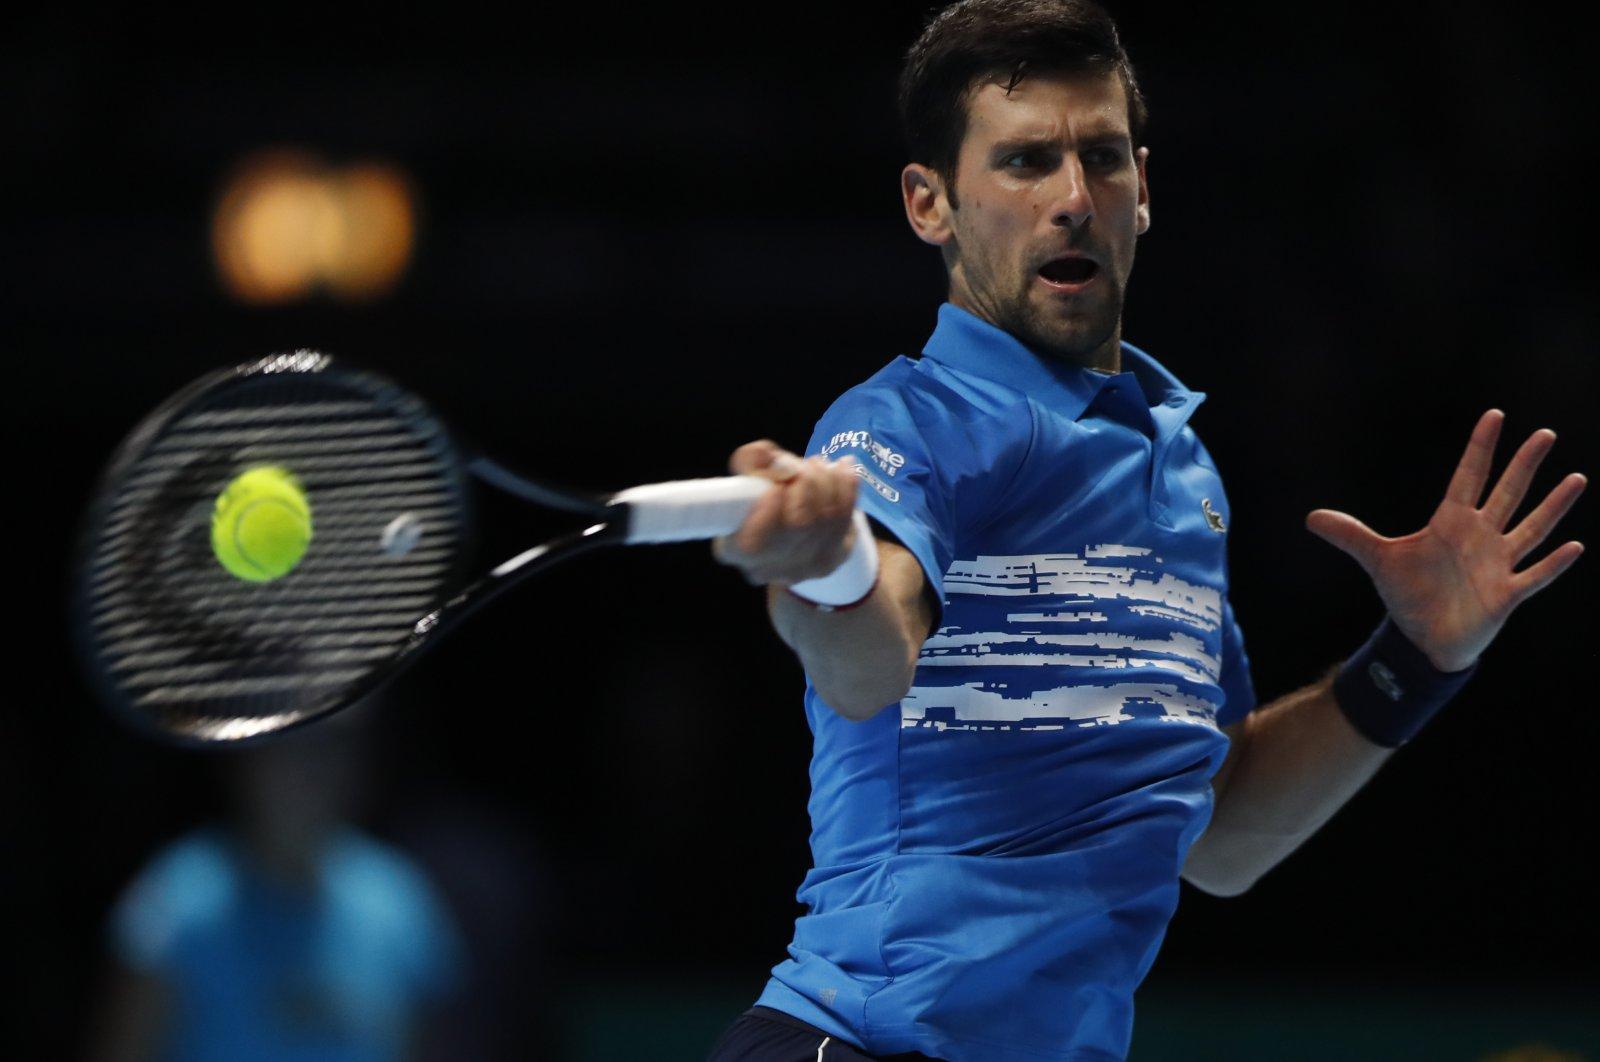 Novak Djokovic plays a return to Matteo Berrettini during an ATP Finals match in London, Britain, Nov. 10, 2019. (AP Photo)